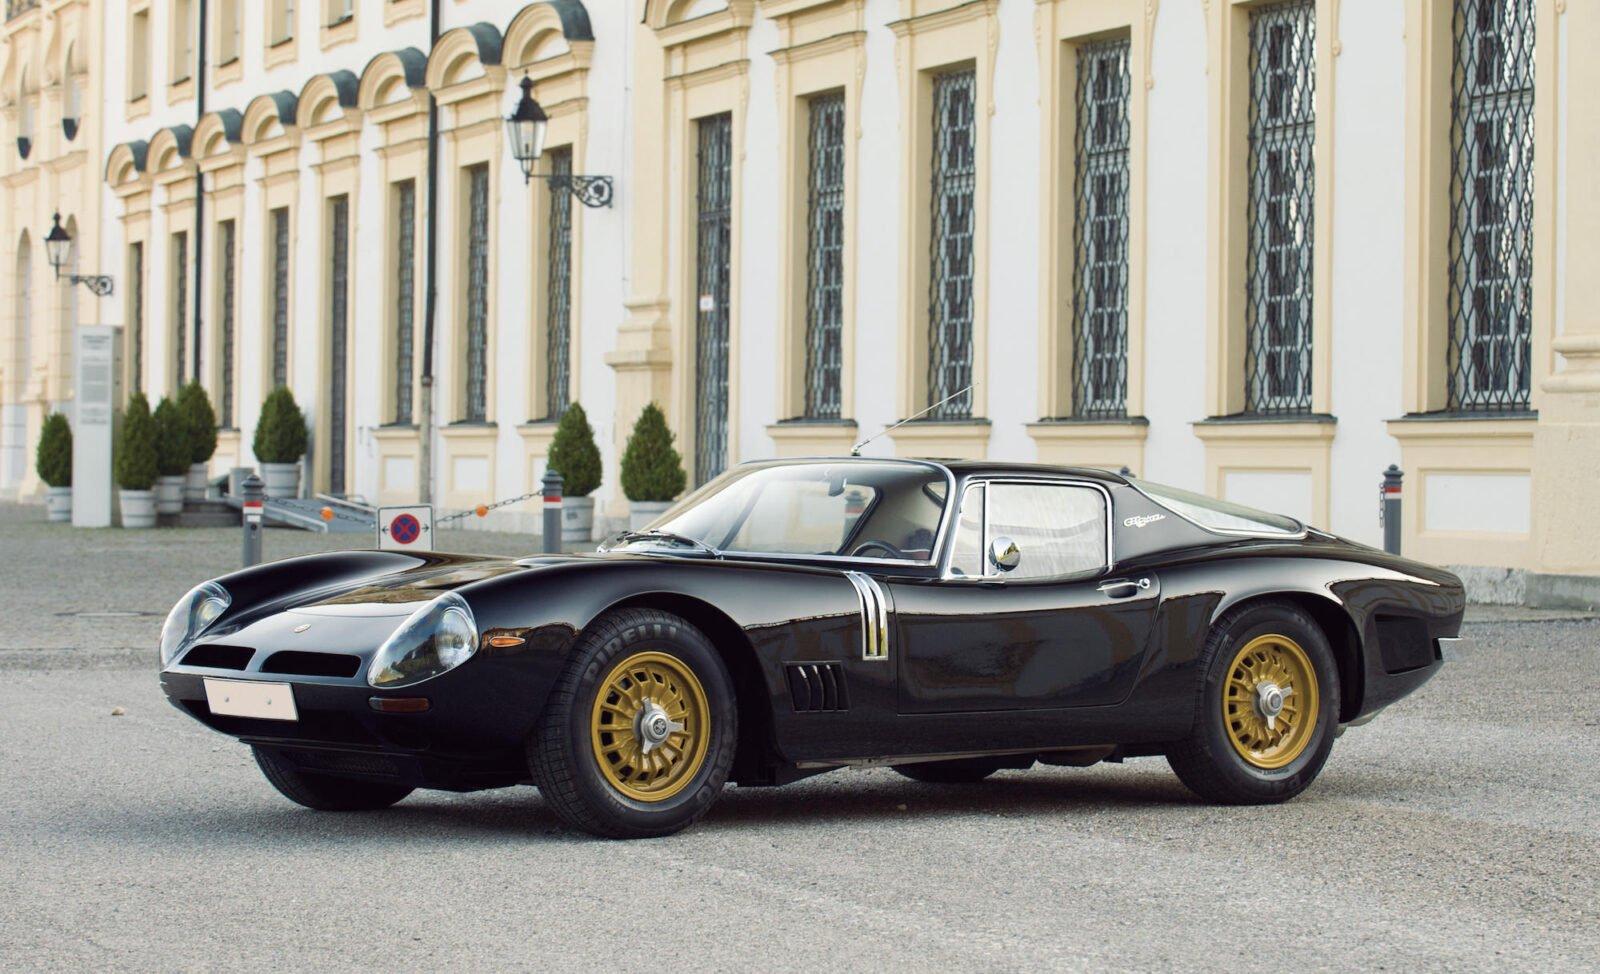 Bizzarini Car 1 1600x974 - Bizzarrini Strada